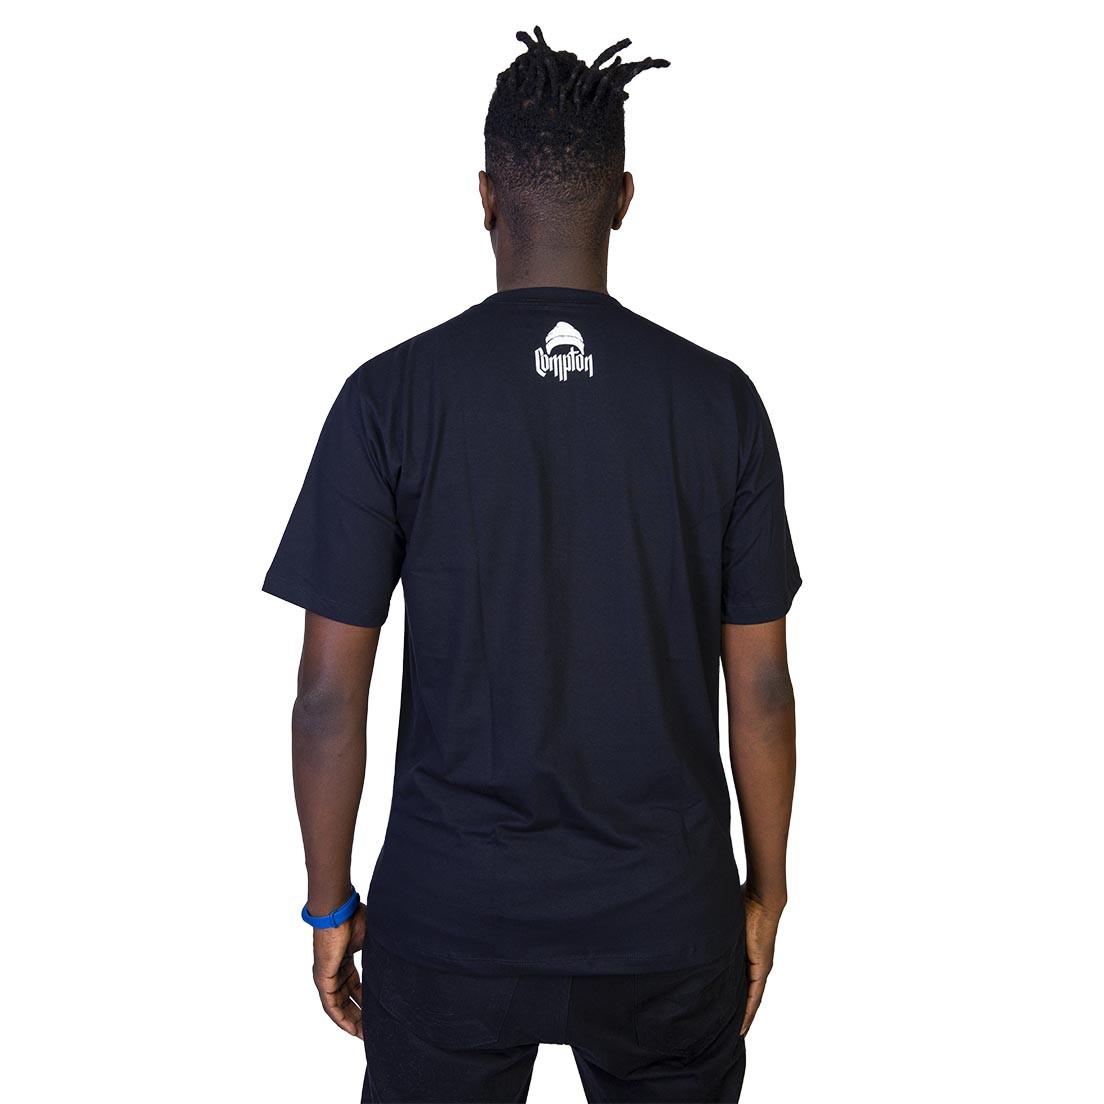 Camiseta Compton All Star Preta